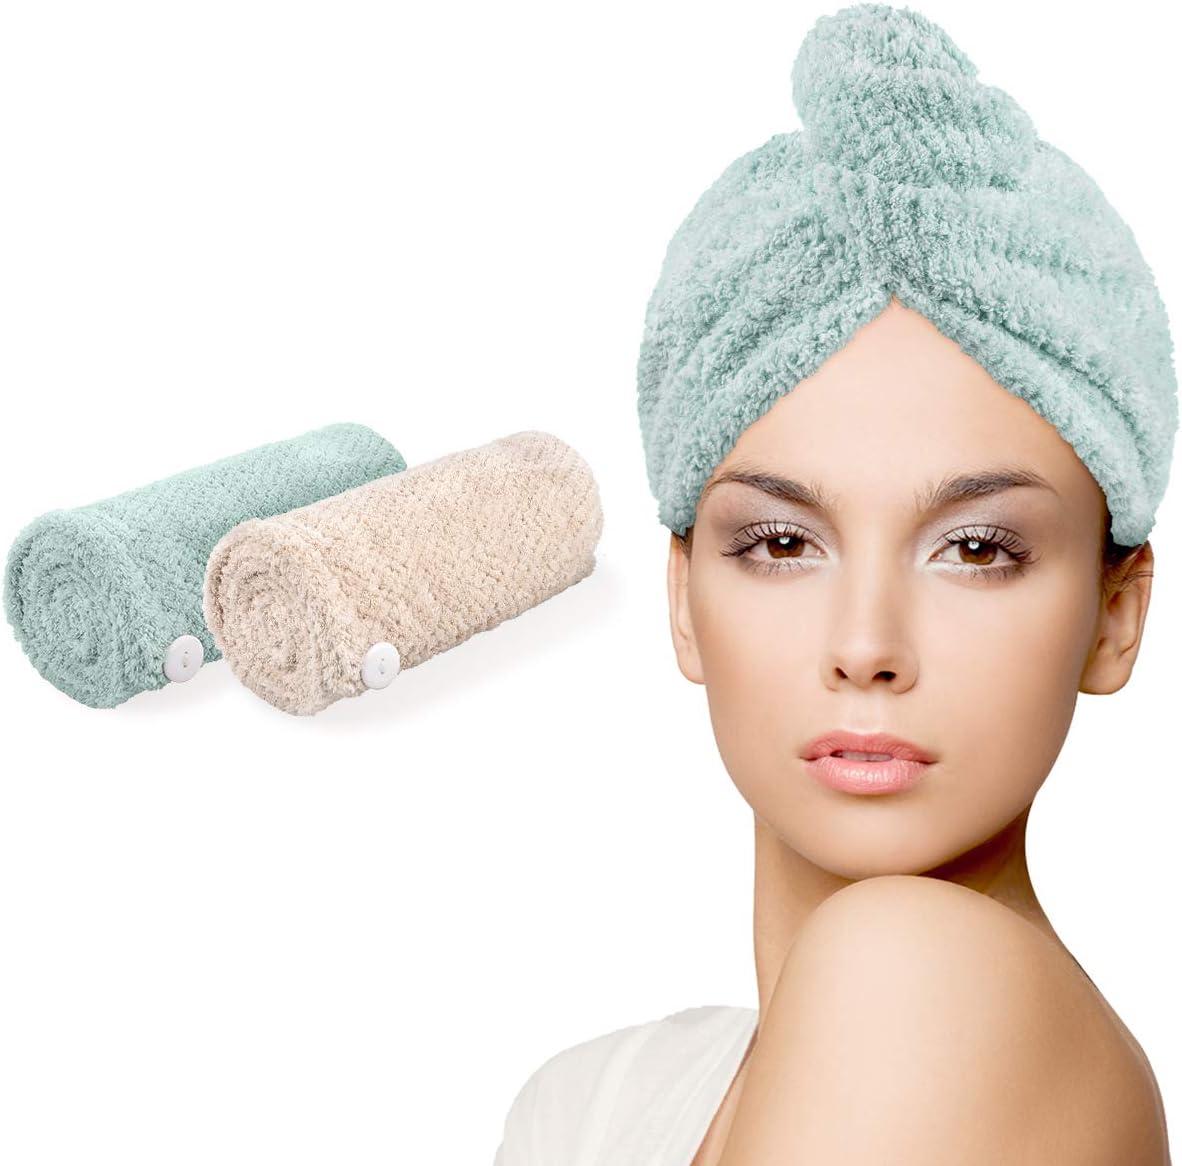 Coffee/&Khaki Fyore Hair Drying Towels Super Absorbent Microfiber Towel Turban Thicken Absorbent dry Hair Towel